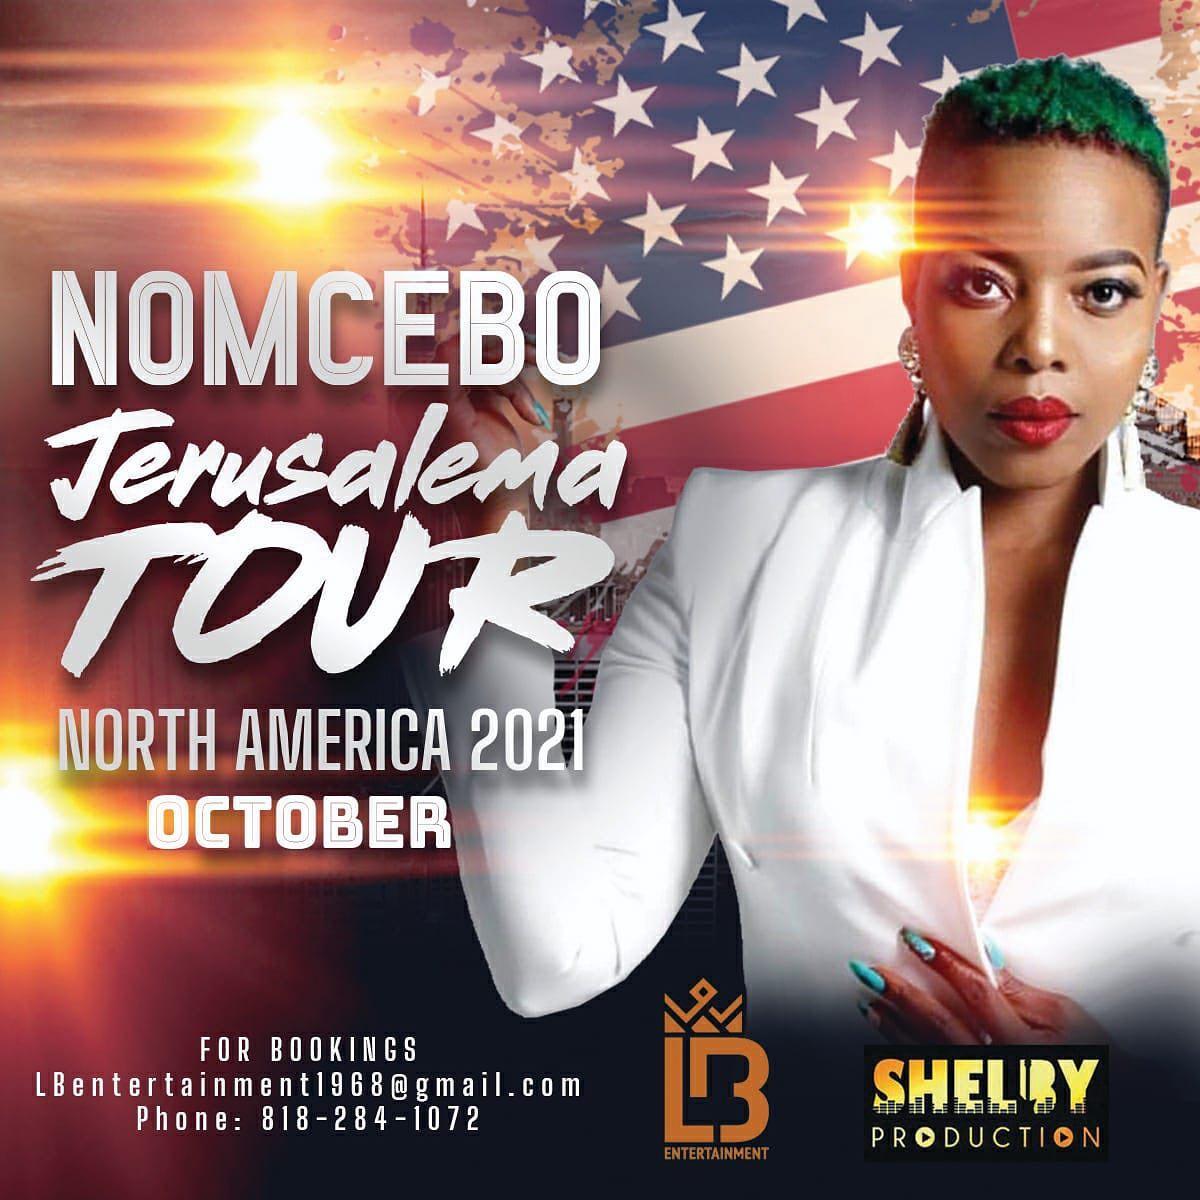 Songbird Nomcebo Zikode takes the Jerusalema Tour to America